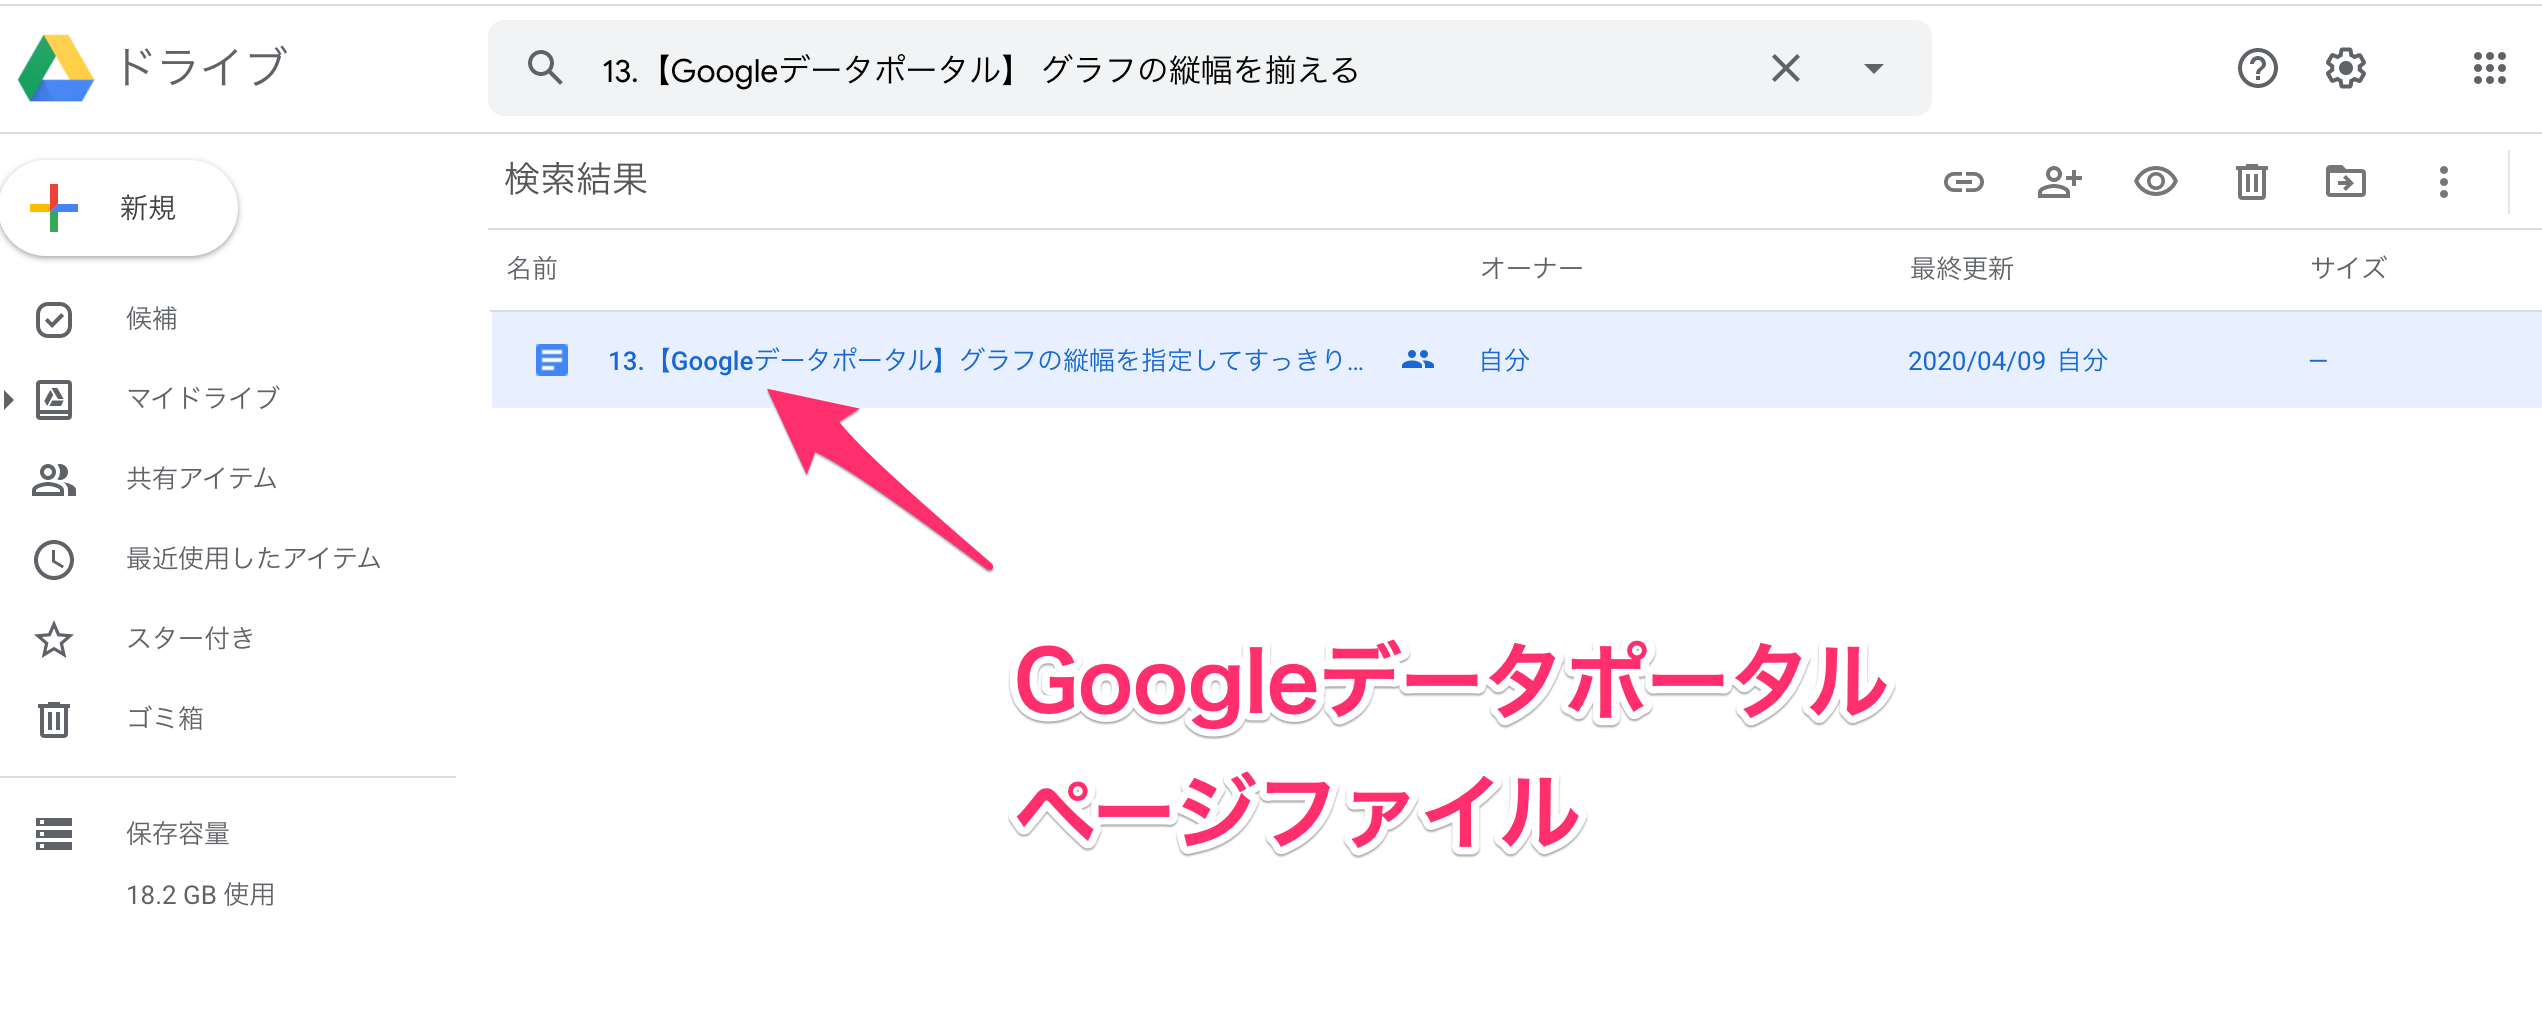 【Googleデータポータル】ダッシュボードの共有方法。閲覧・編集権限と公開範囲を理解する